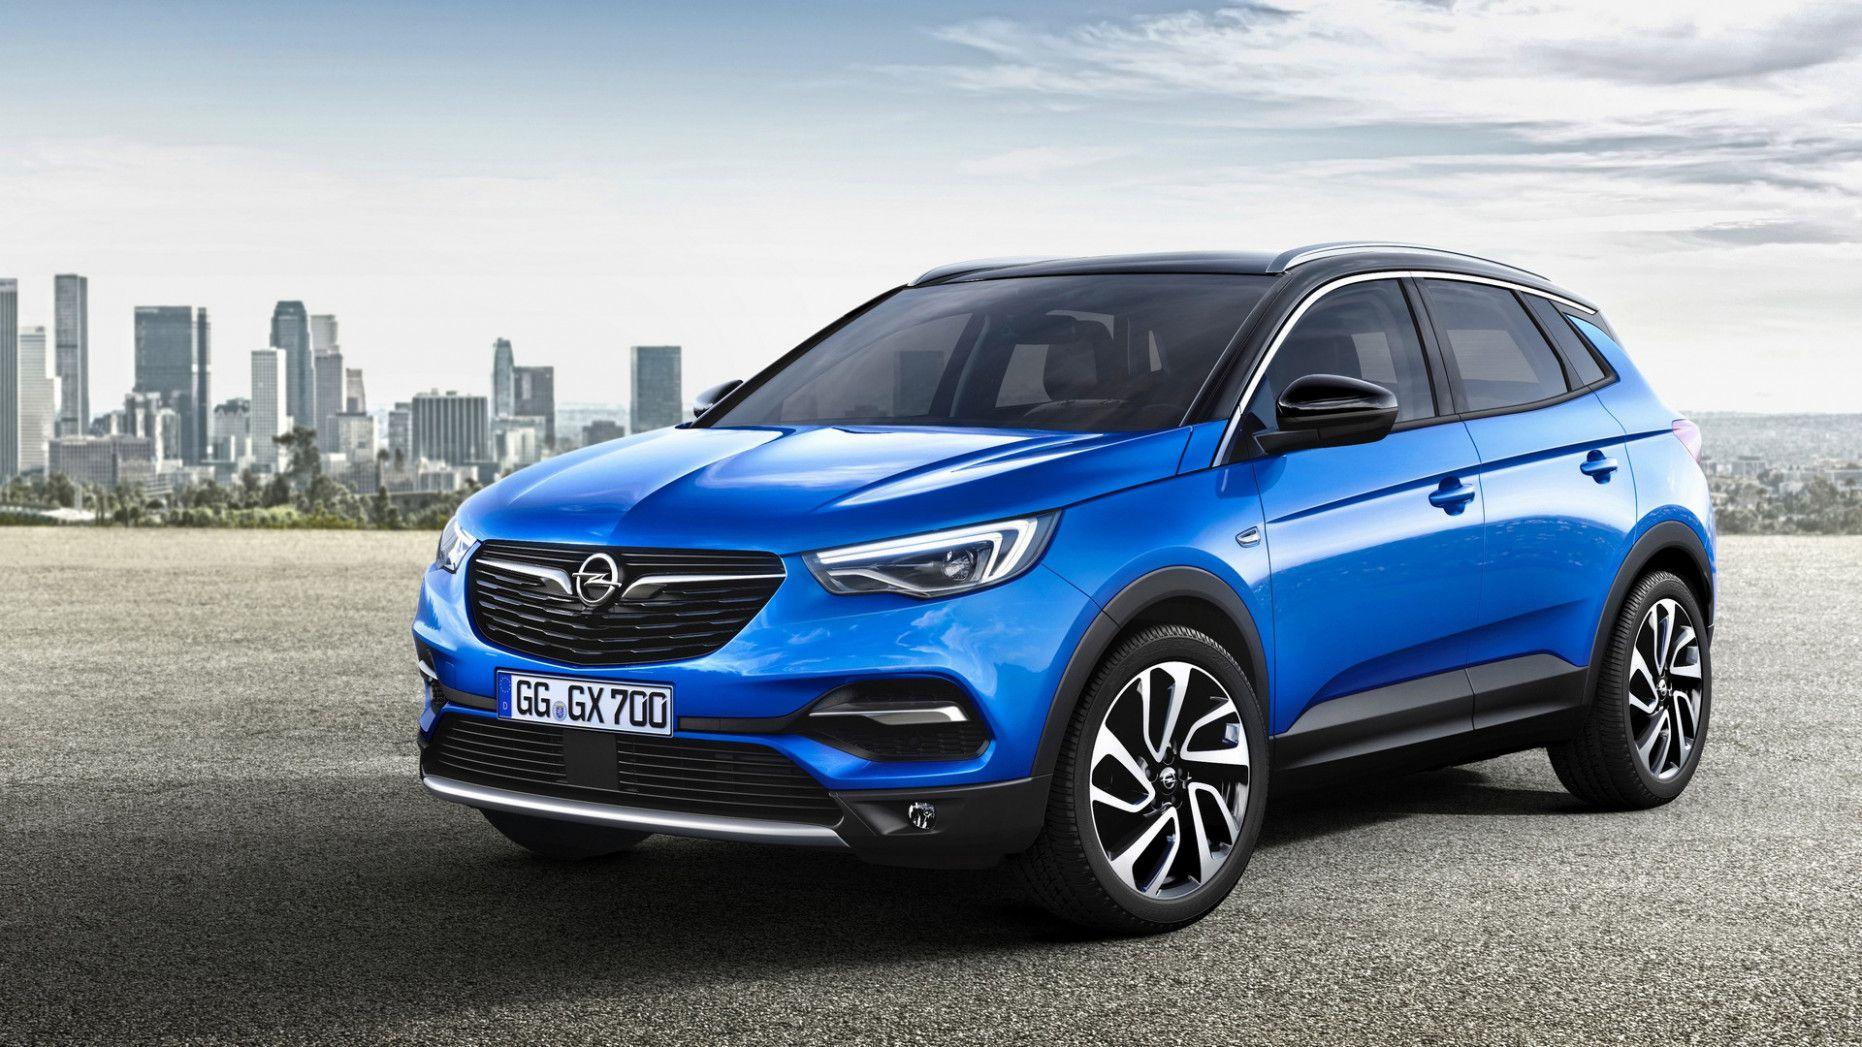 8 Picture Opel Fiyatlari 2020 In 2020 Vauxhall Opel Suv